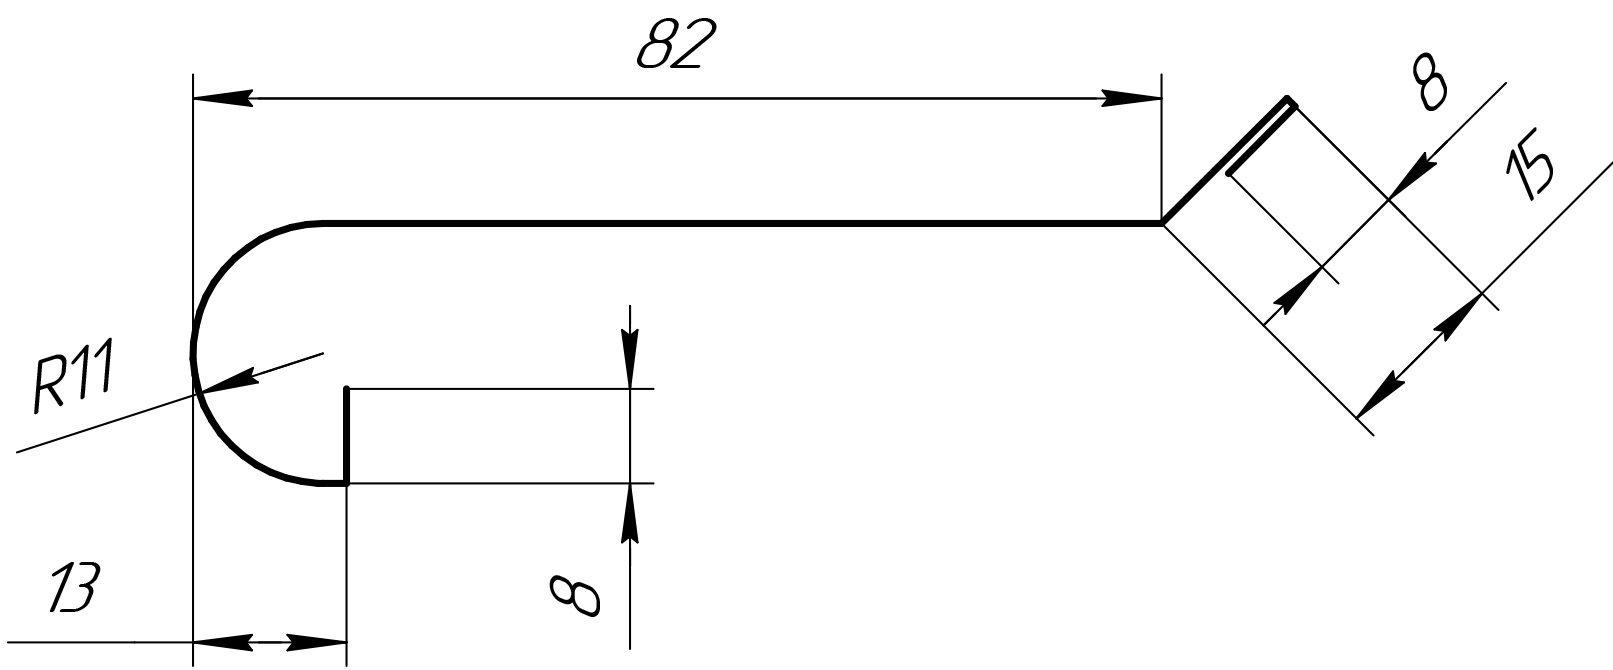 kompas-viola-frw